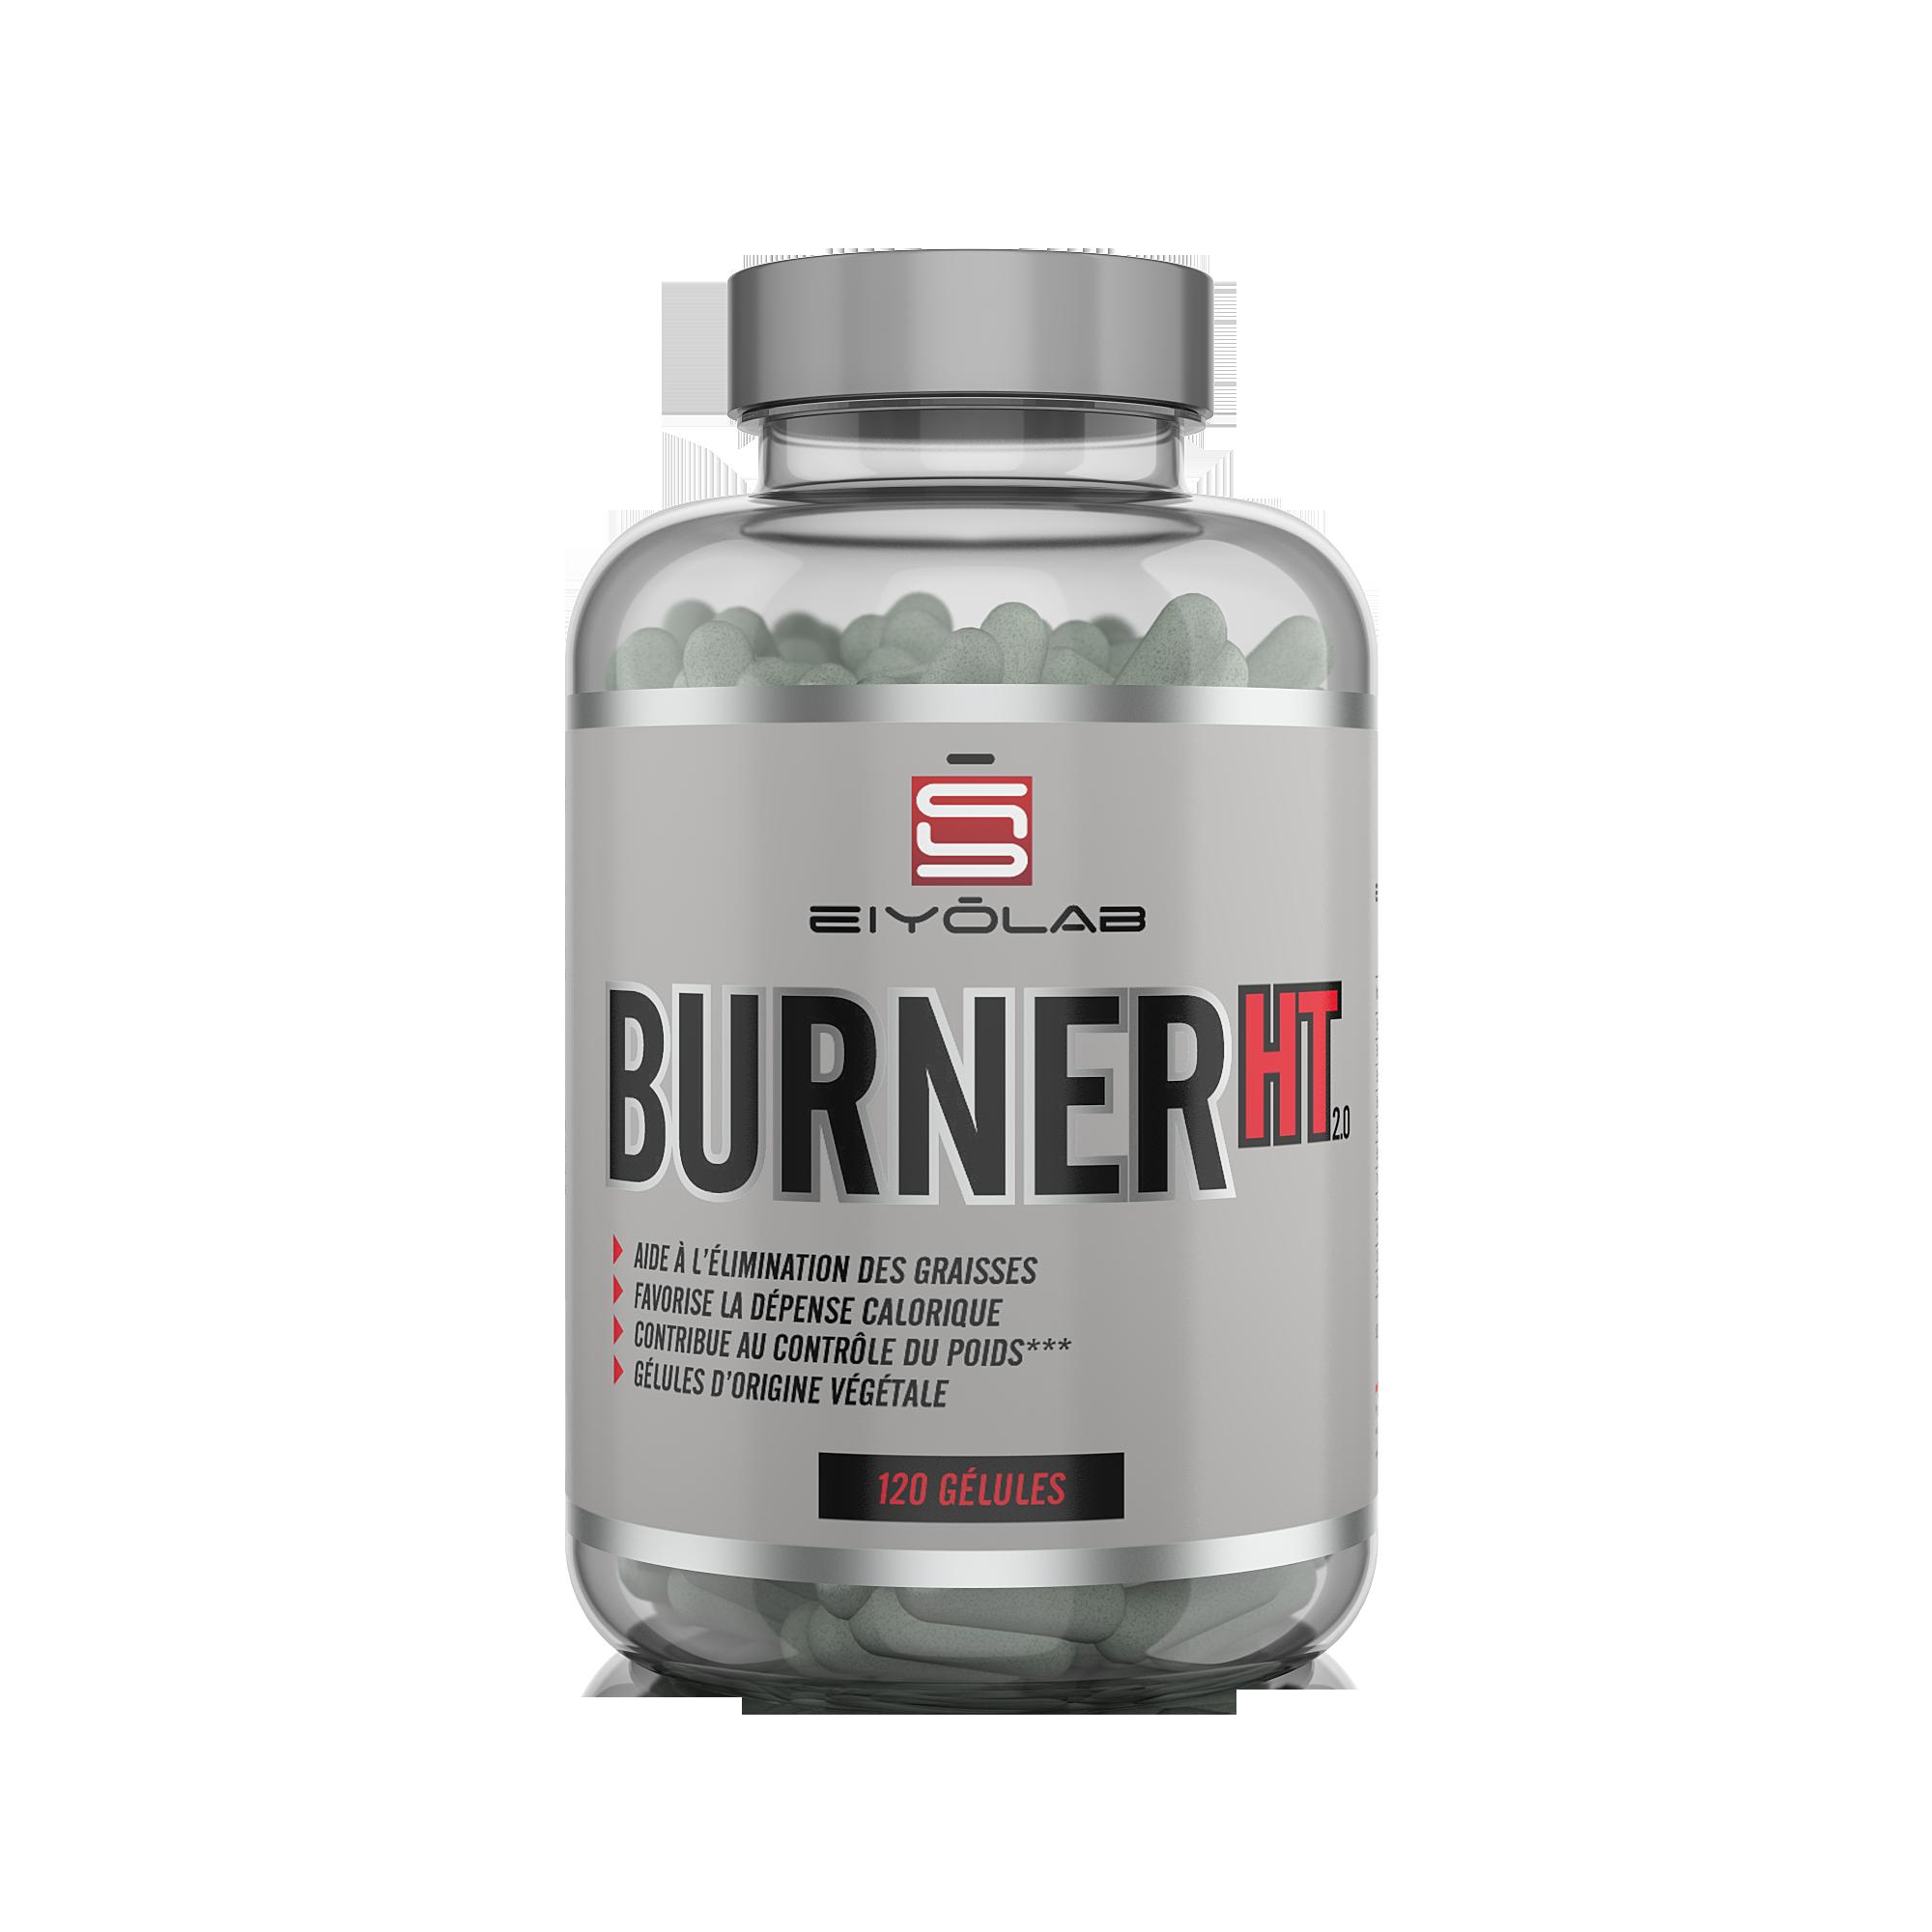 Burner HT 2.0